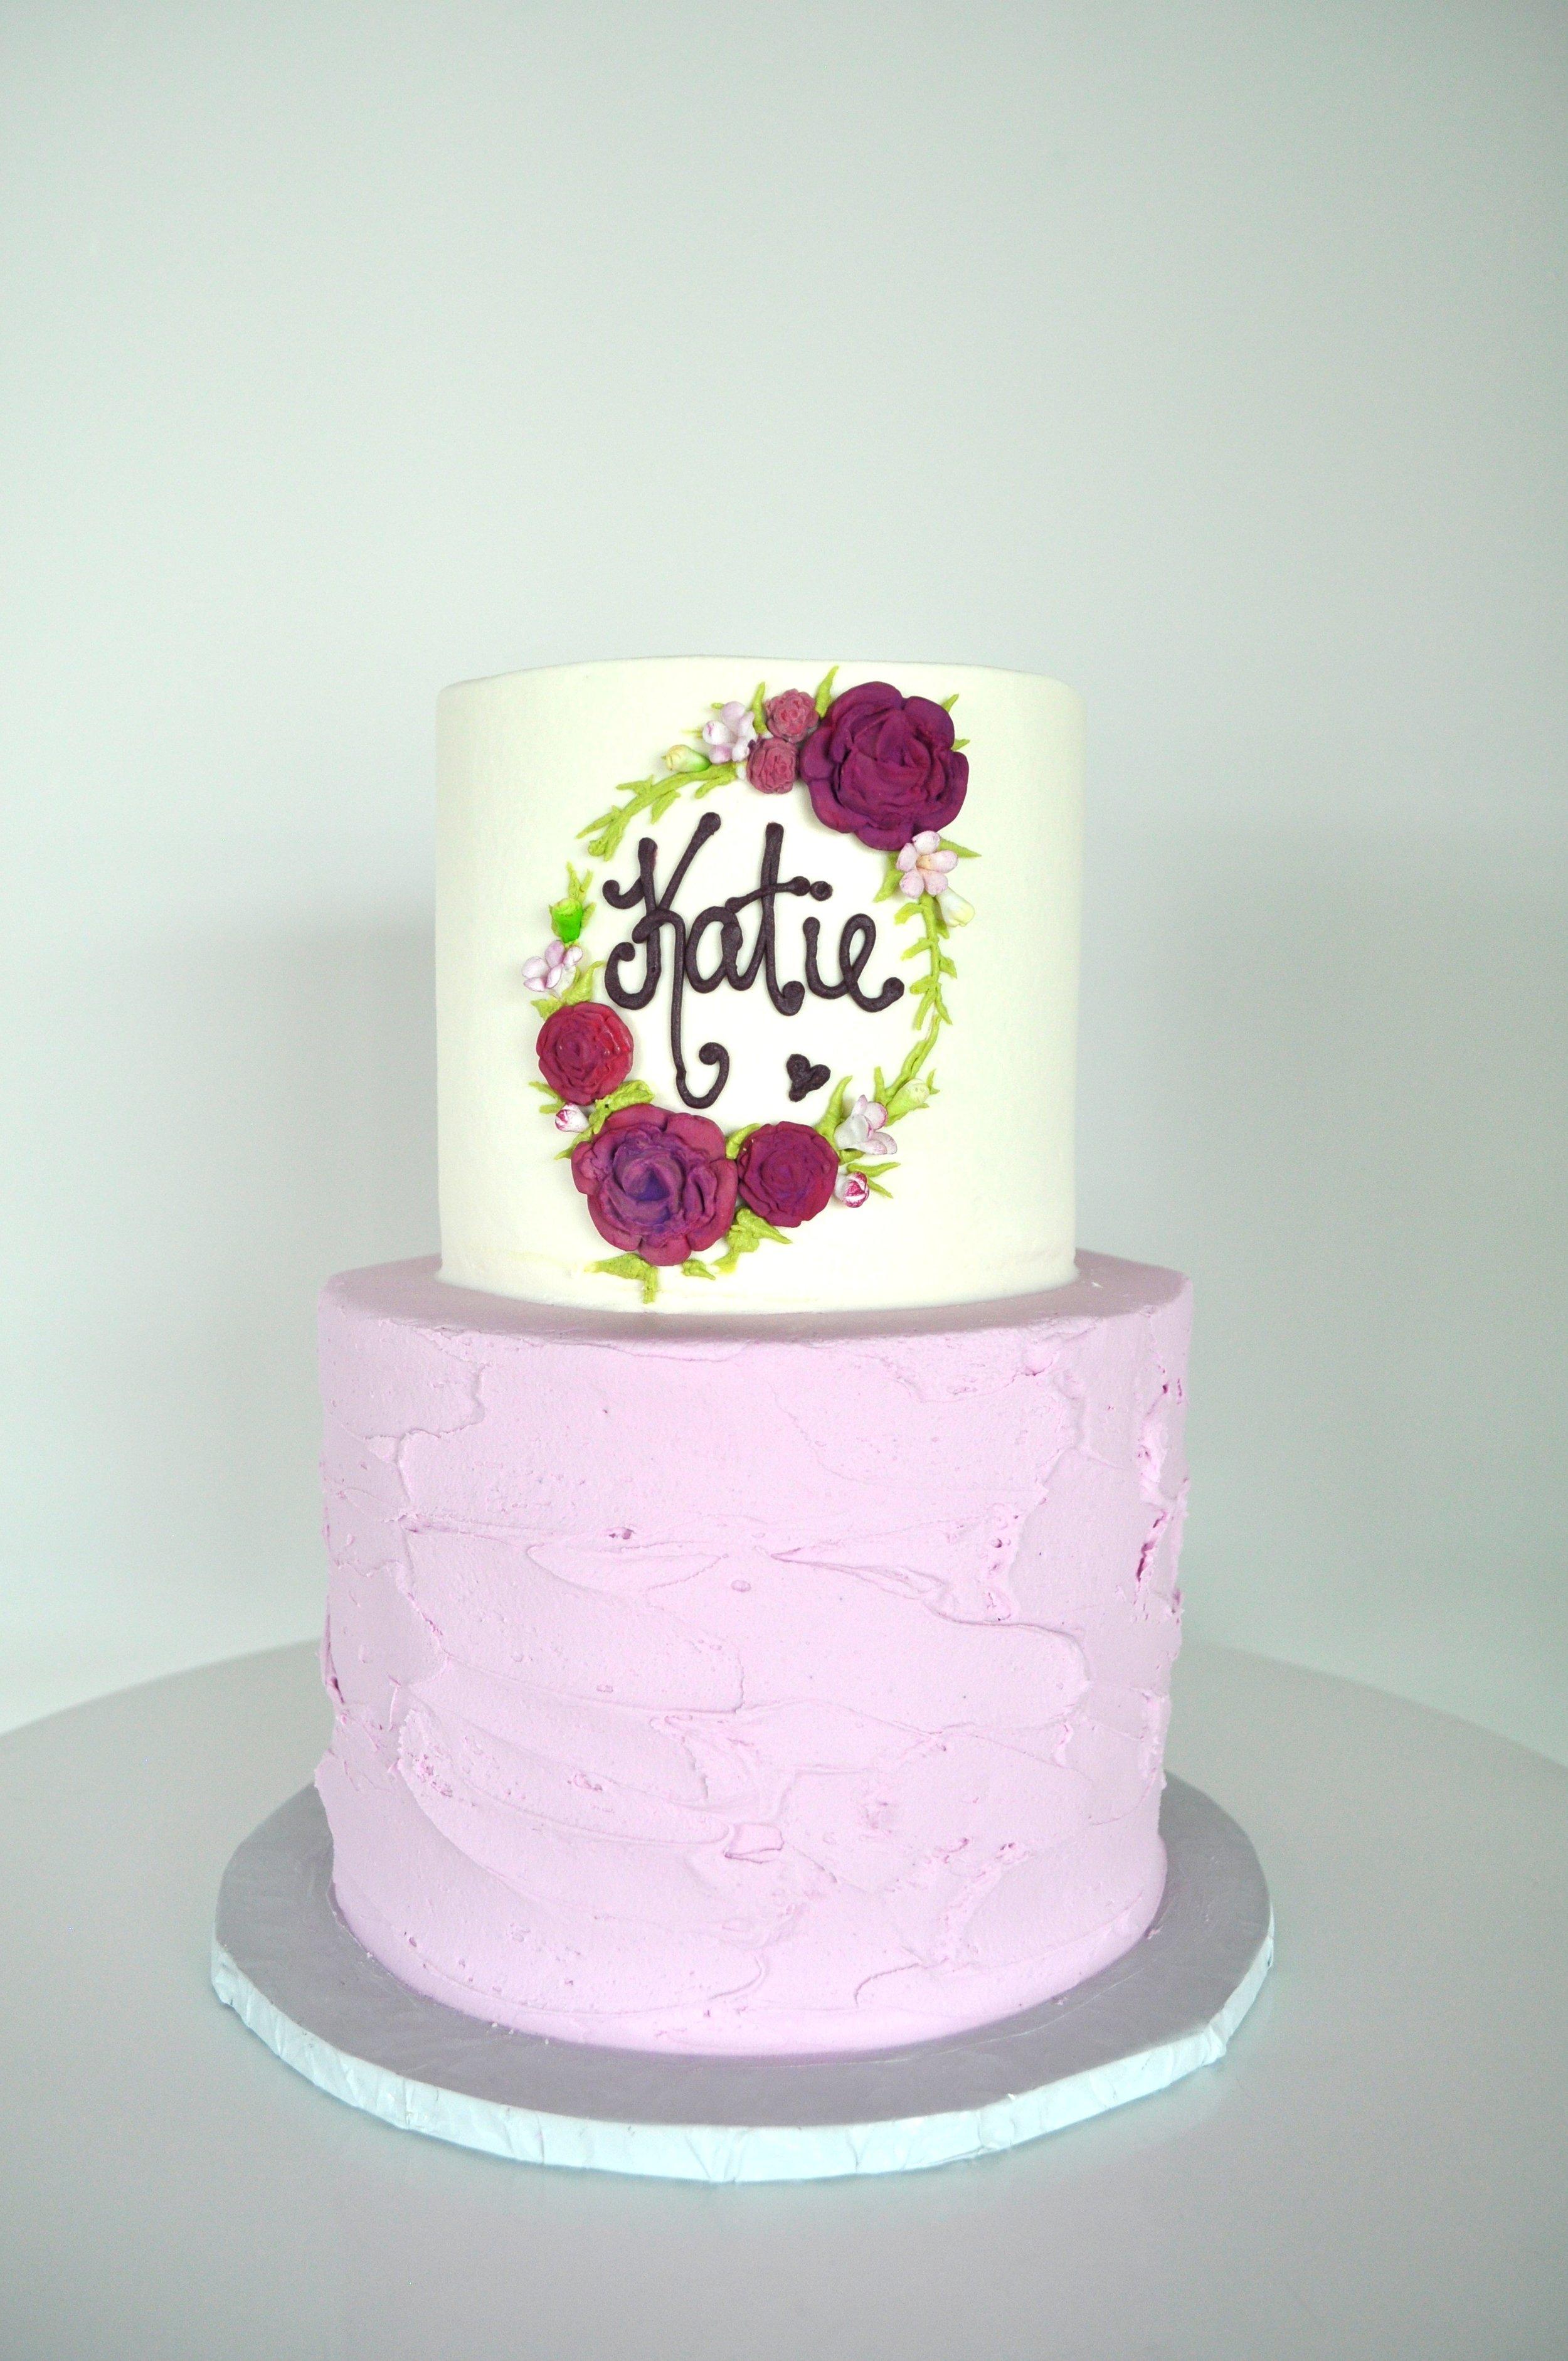 Floral Name Cake.jpg